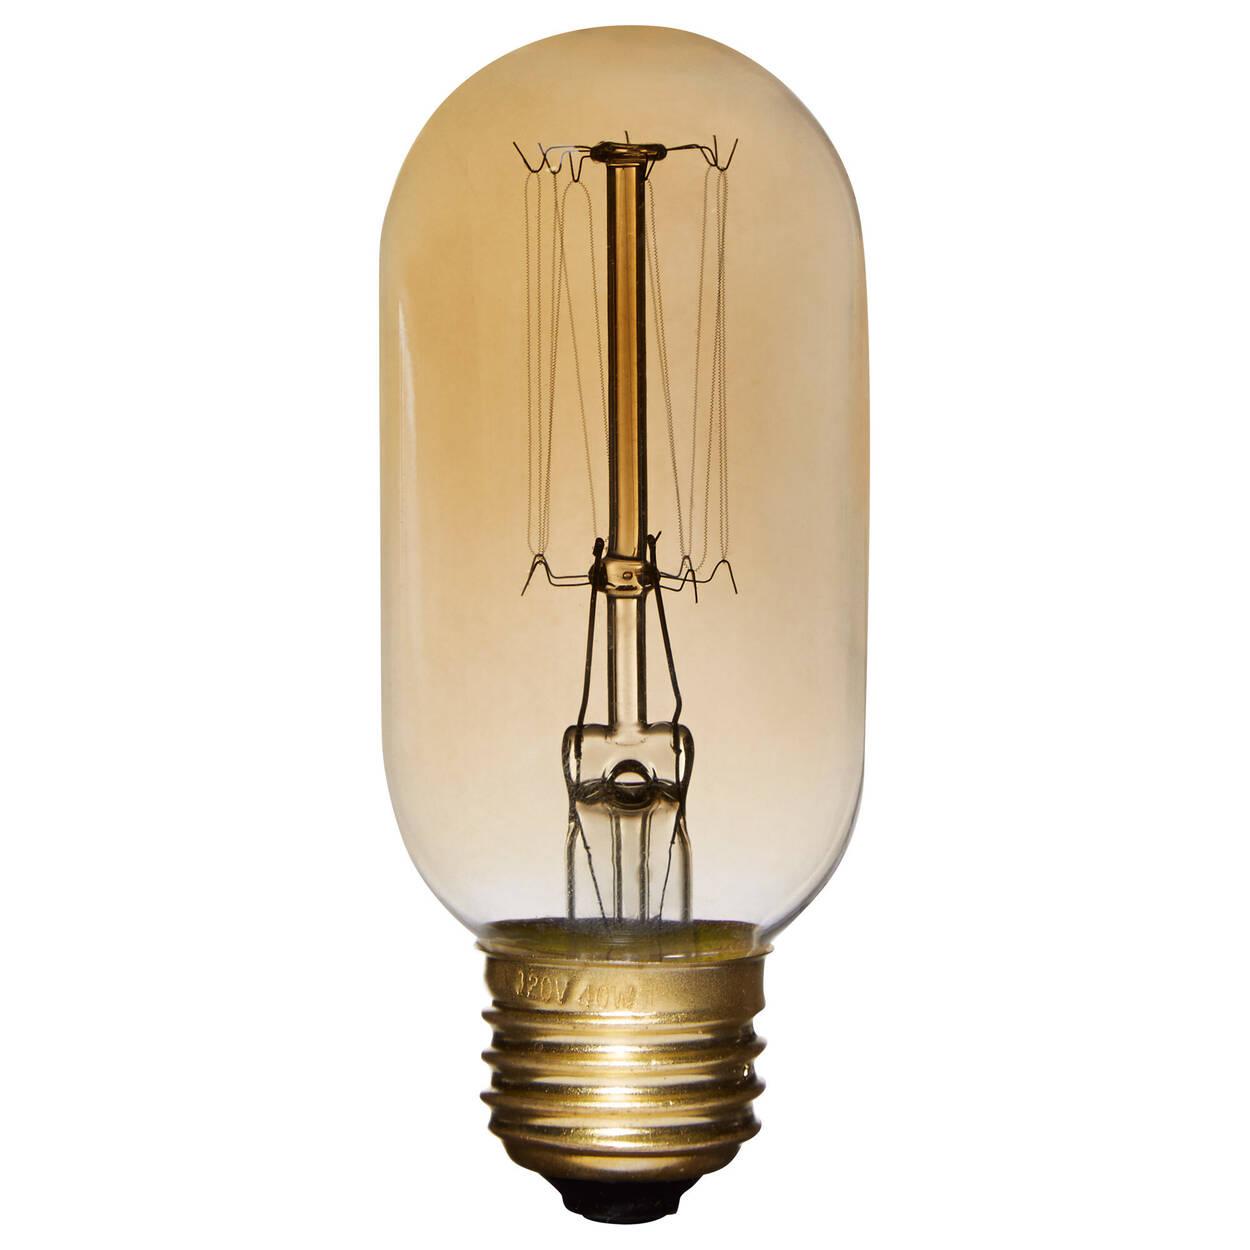 Vintage Edison Tubular Light Bulb